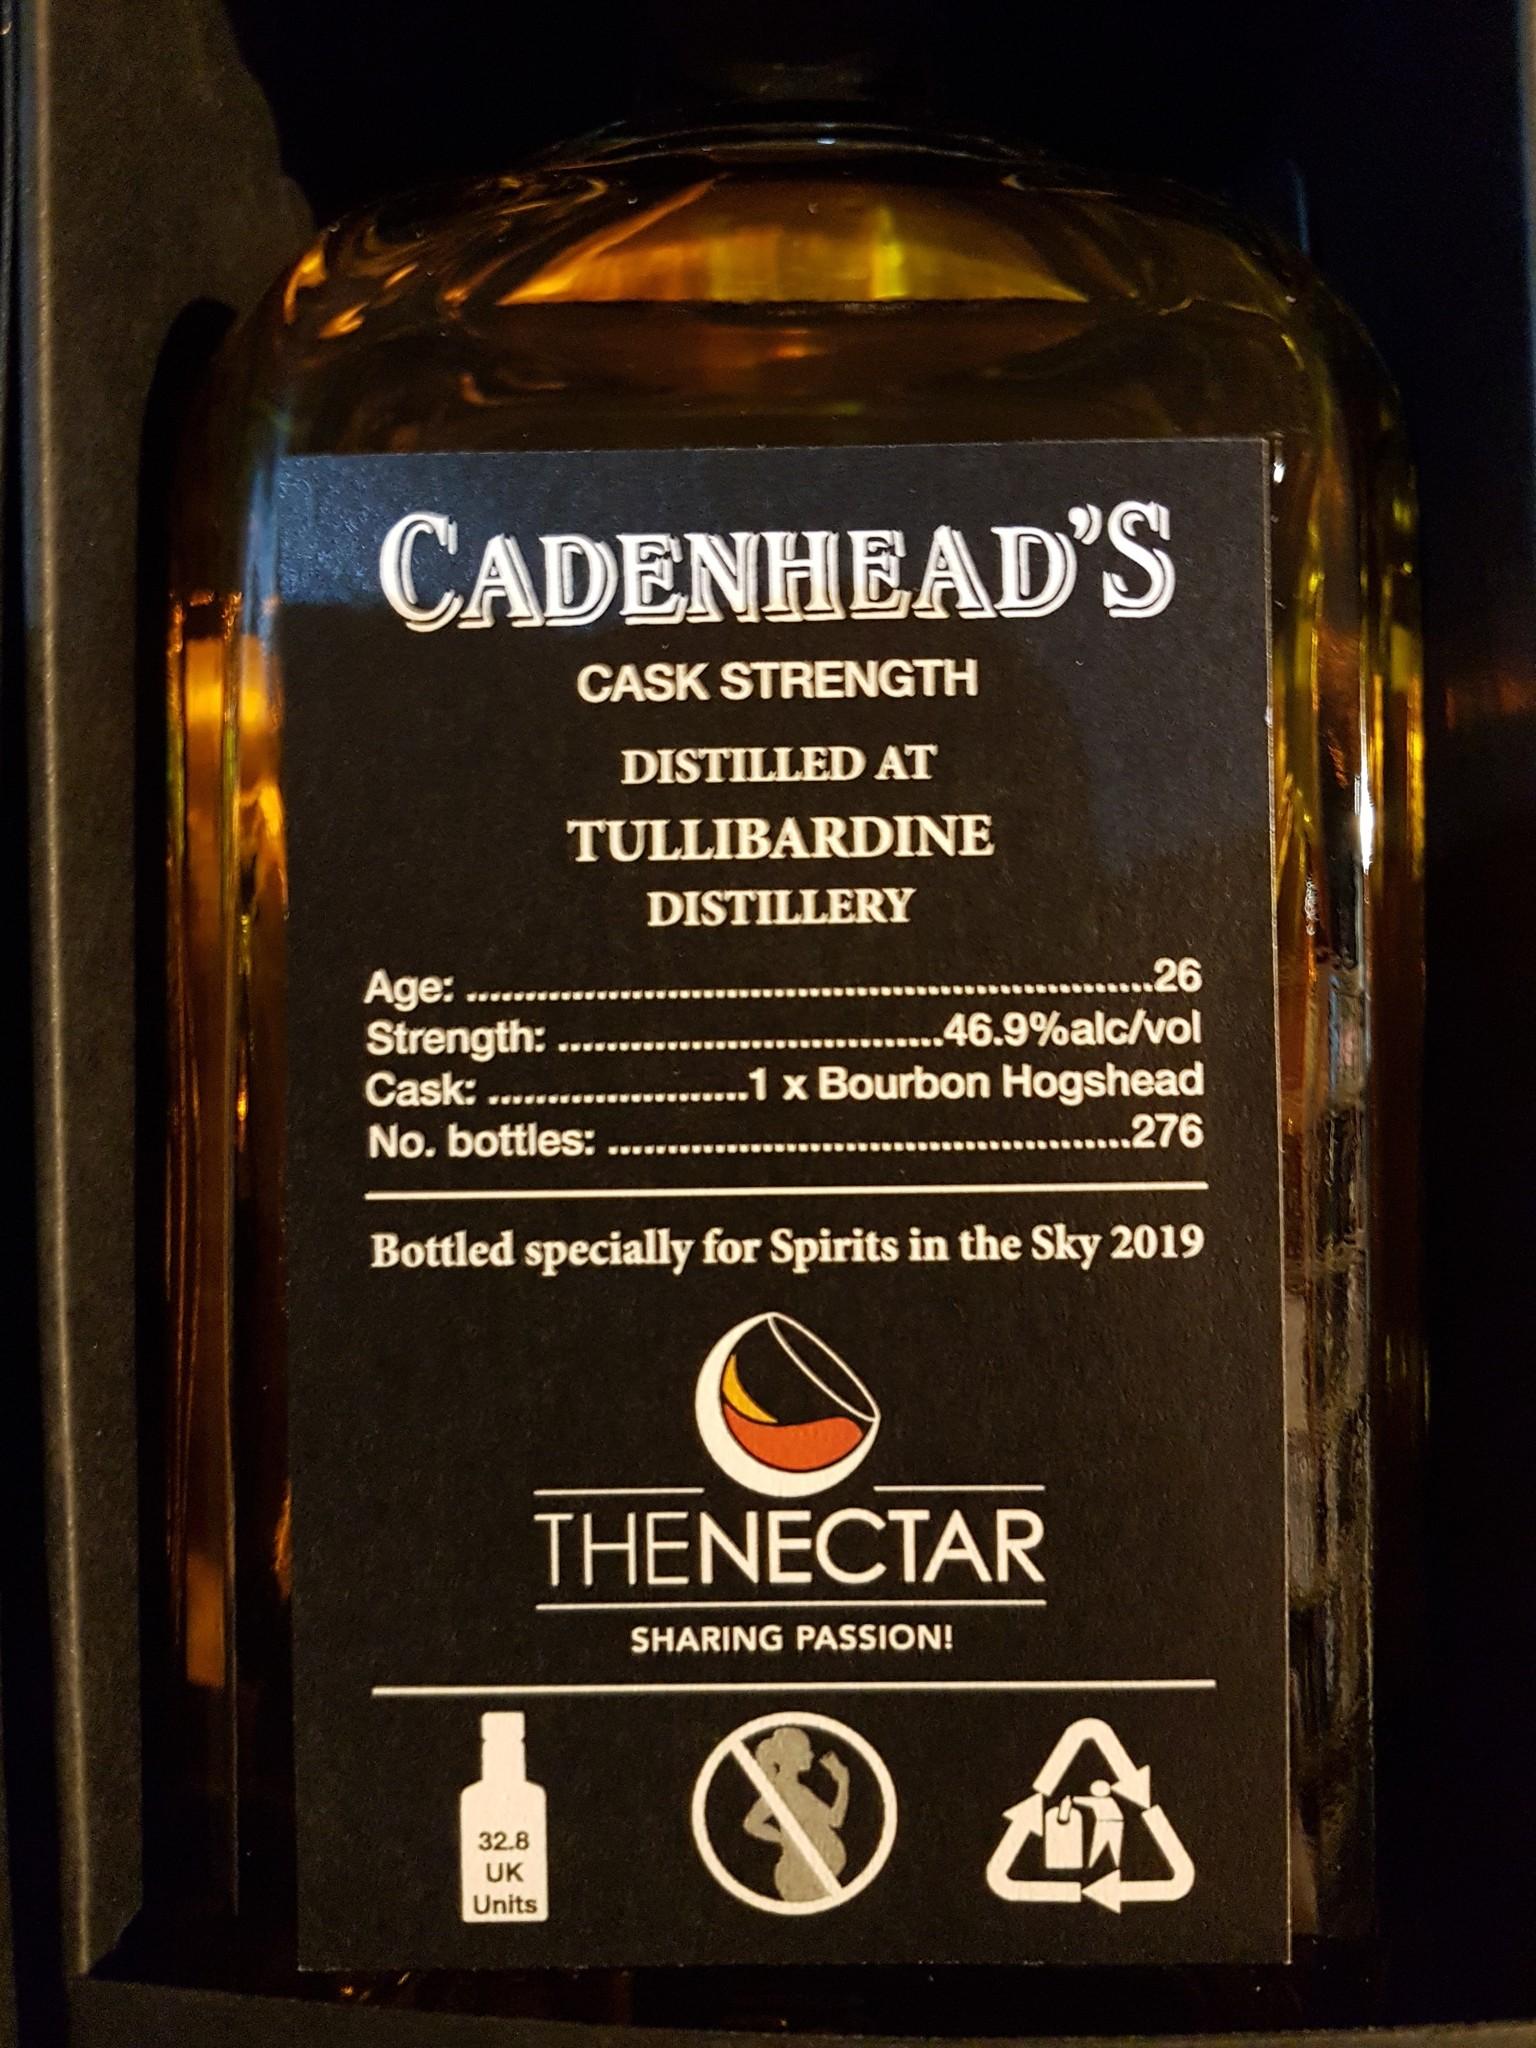 Cadenhead Tullibardine 26Y 1993-2019 46.9% Cadenhead small batch